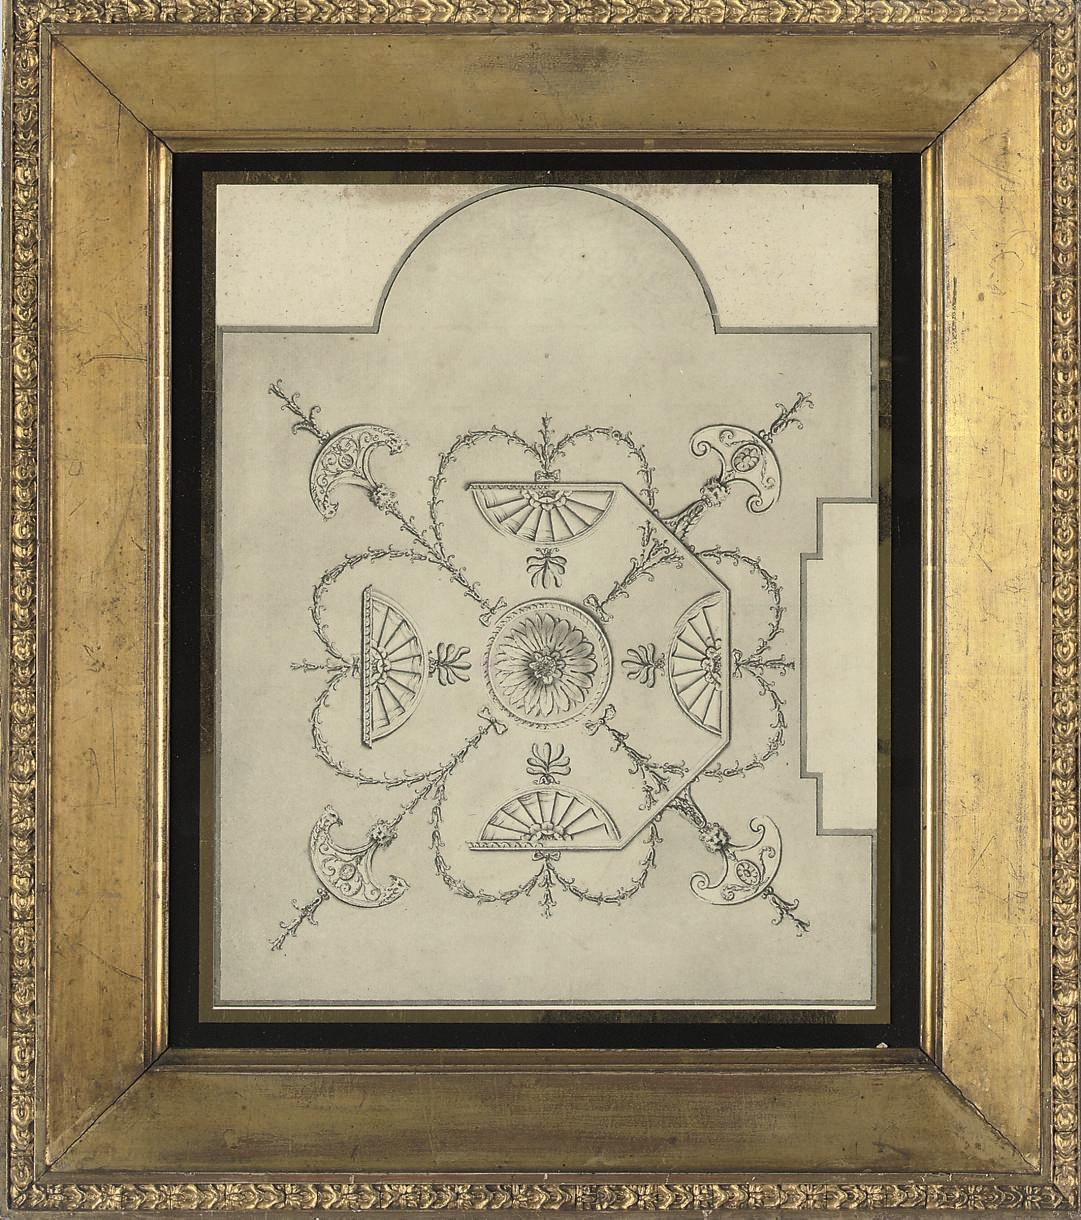 A neo-classical ceiling design